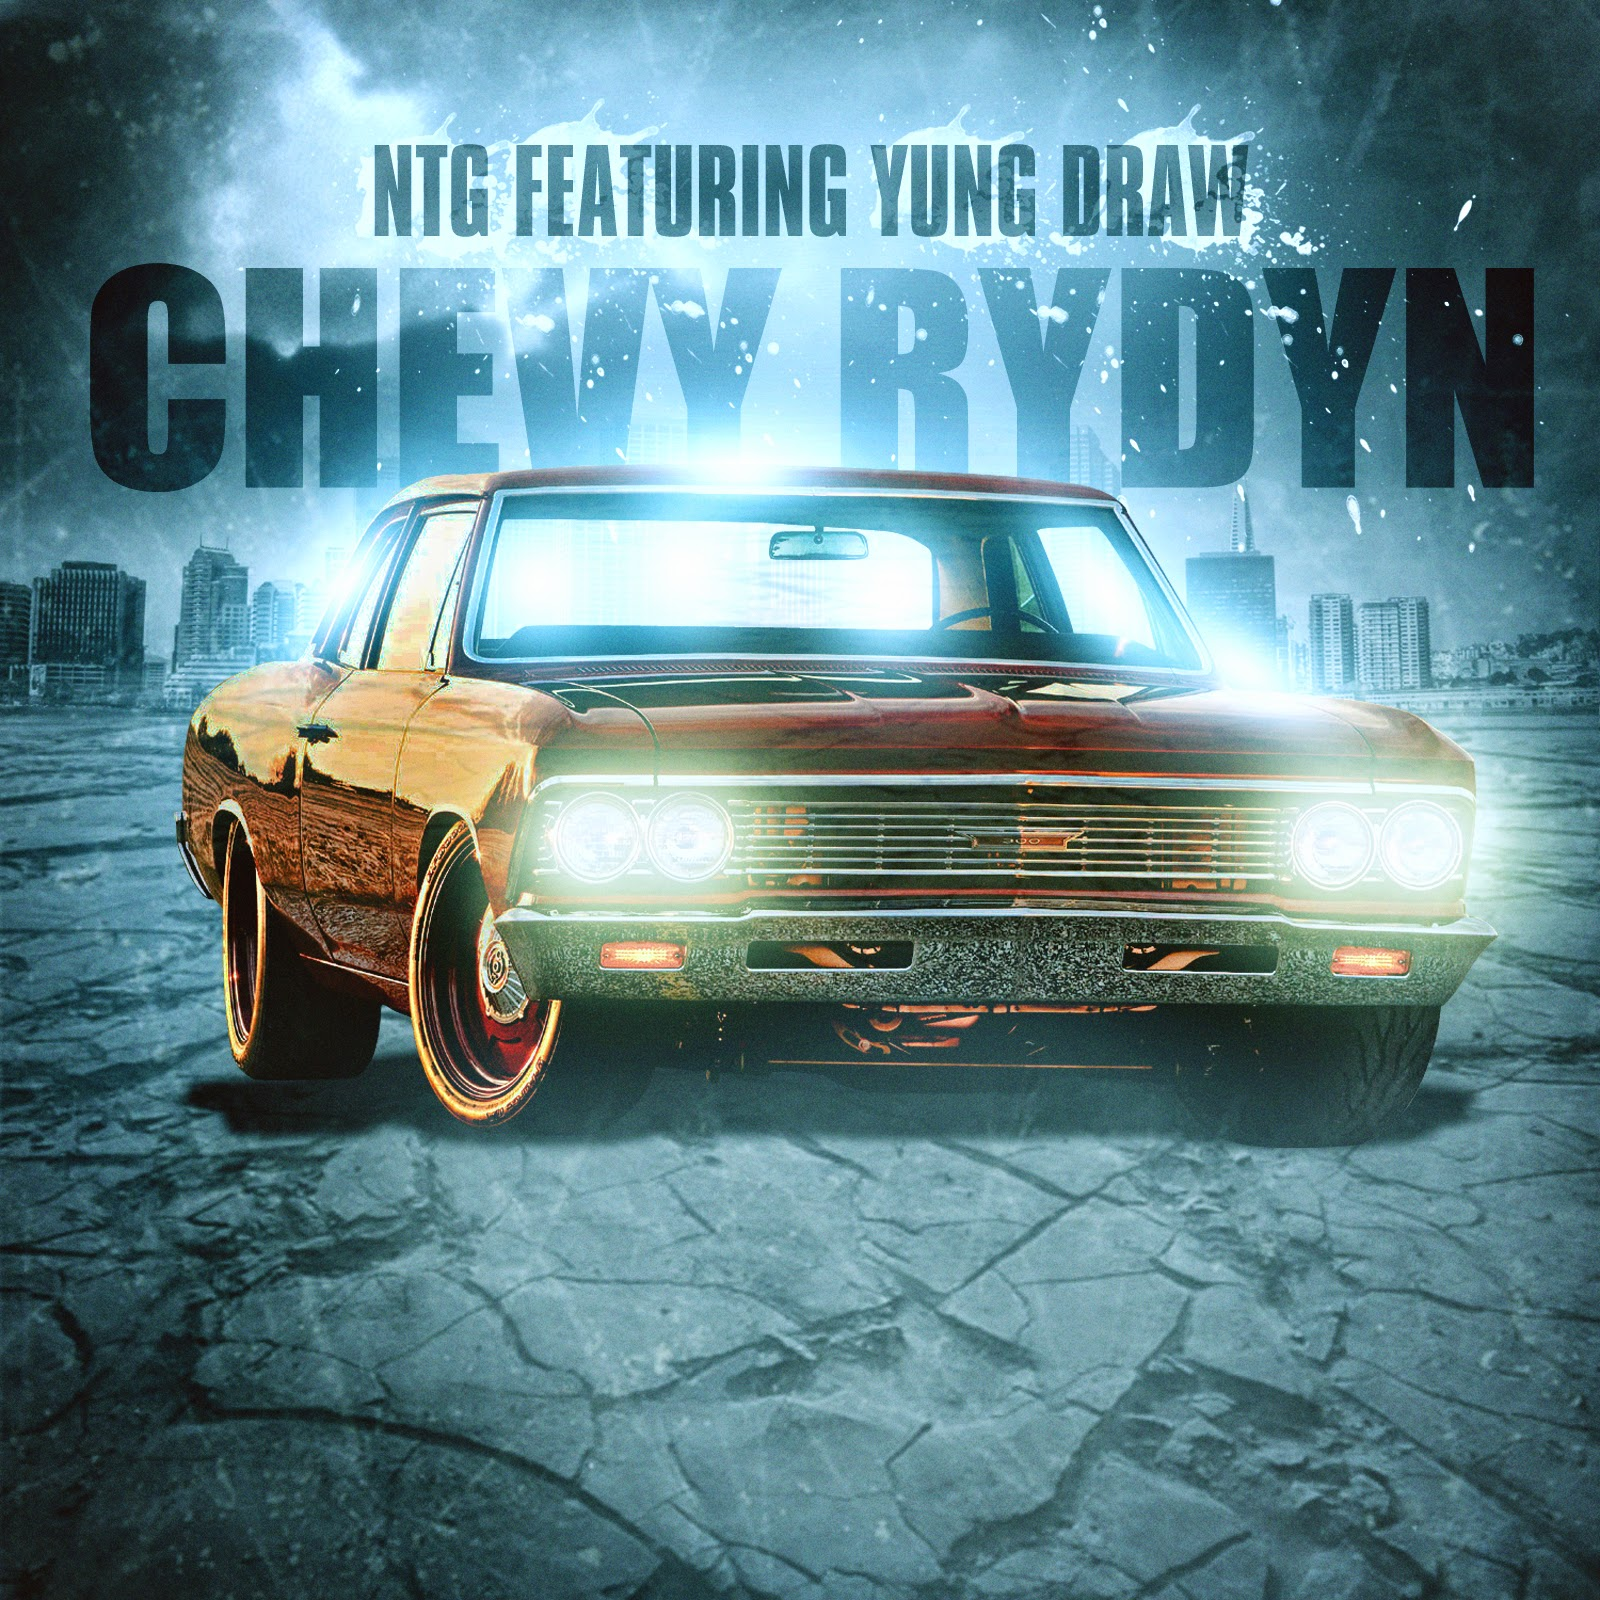 https://play.google.com/store/music/album/NTG_Yung_Draw_Chevy_Rydyn?id=Busjjgjrcbpop6hrmk5gdmxm6wu